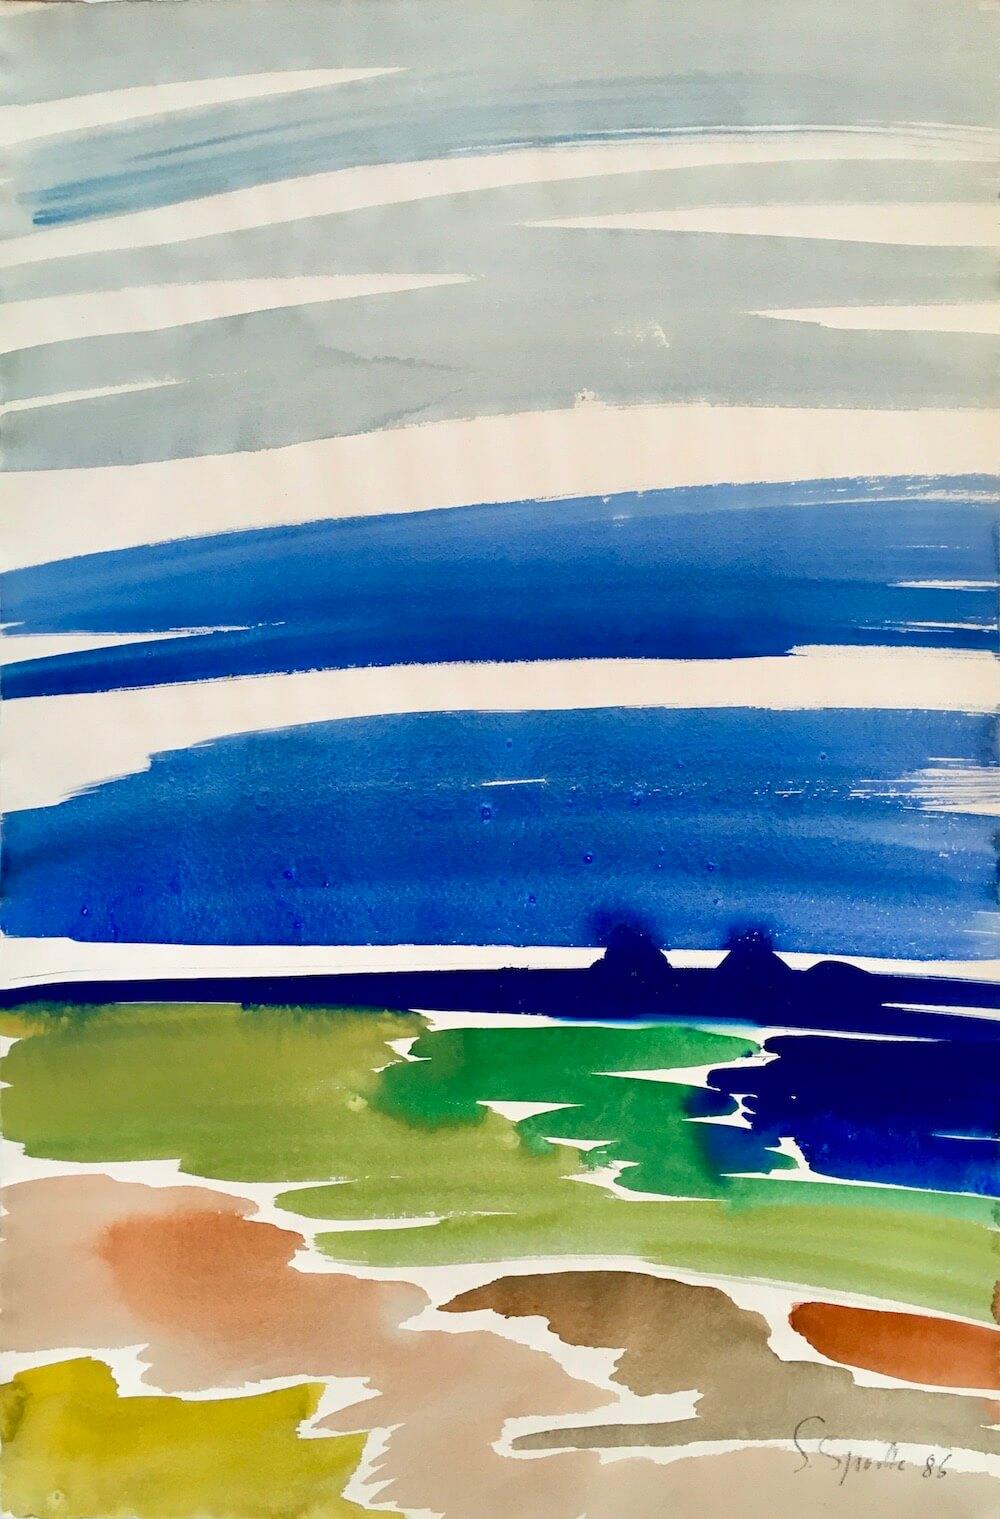 Siegward Sprotte, Zyklus Hohe Himmel, 1986, Aquarell auf Bütten, 78,5 x 52 cm